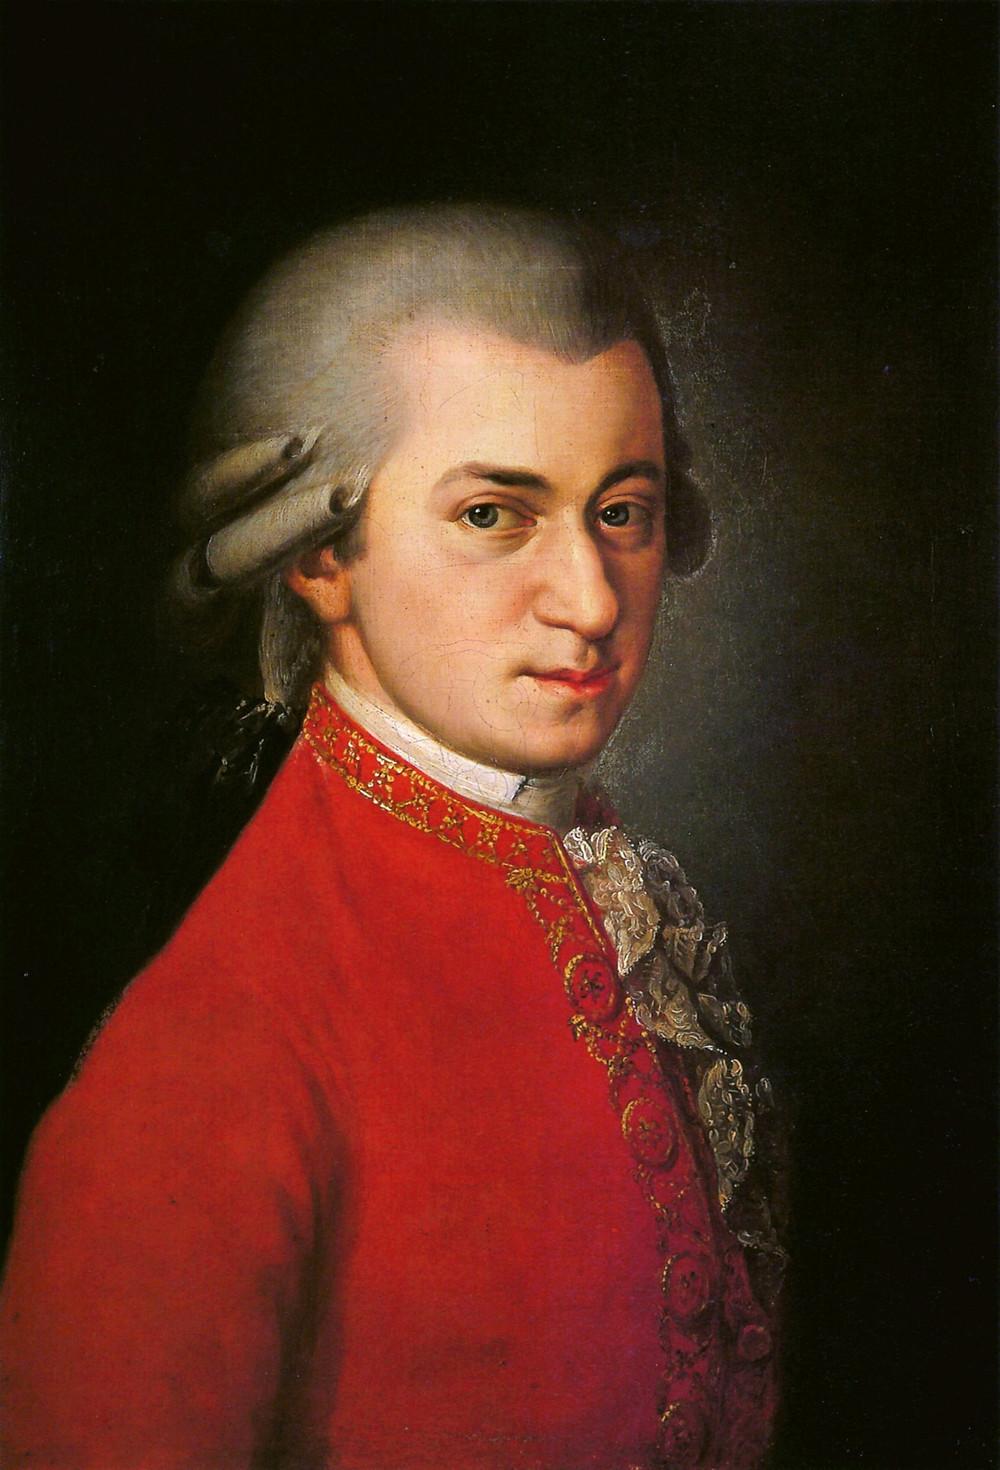 Retrato de Wolfgang Amadeus Mozart, por Barbara Krafft